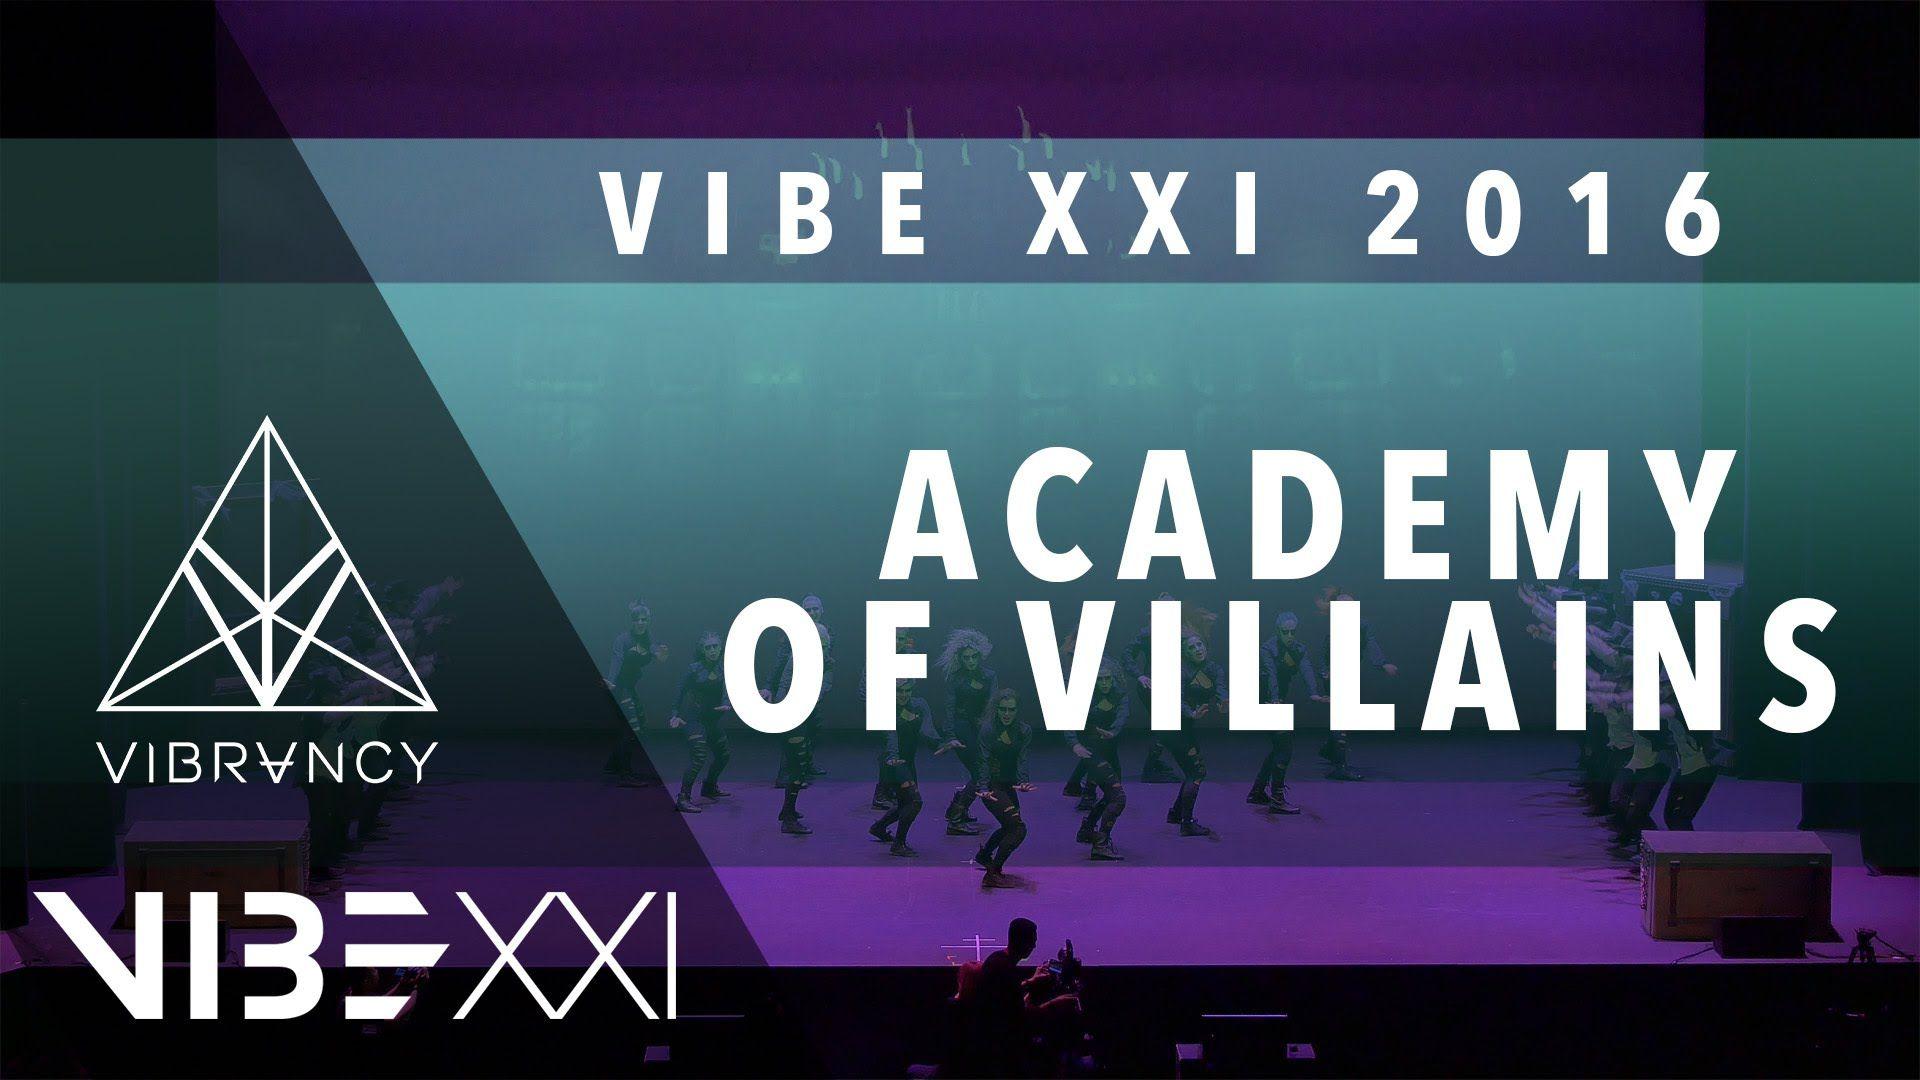 Academy of villains vibe xxi 2016 vibrvncy 4k